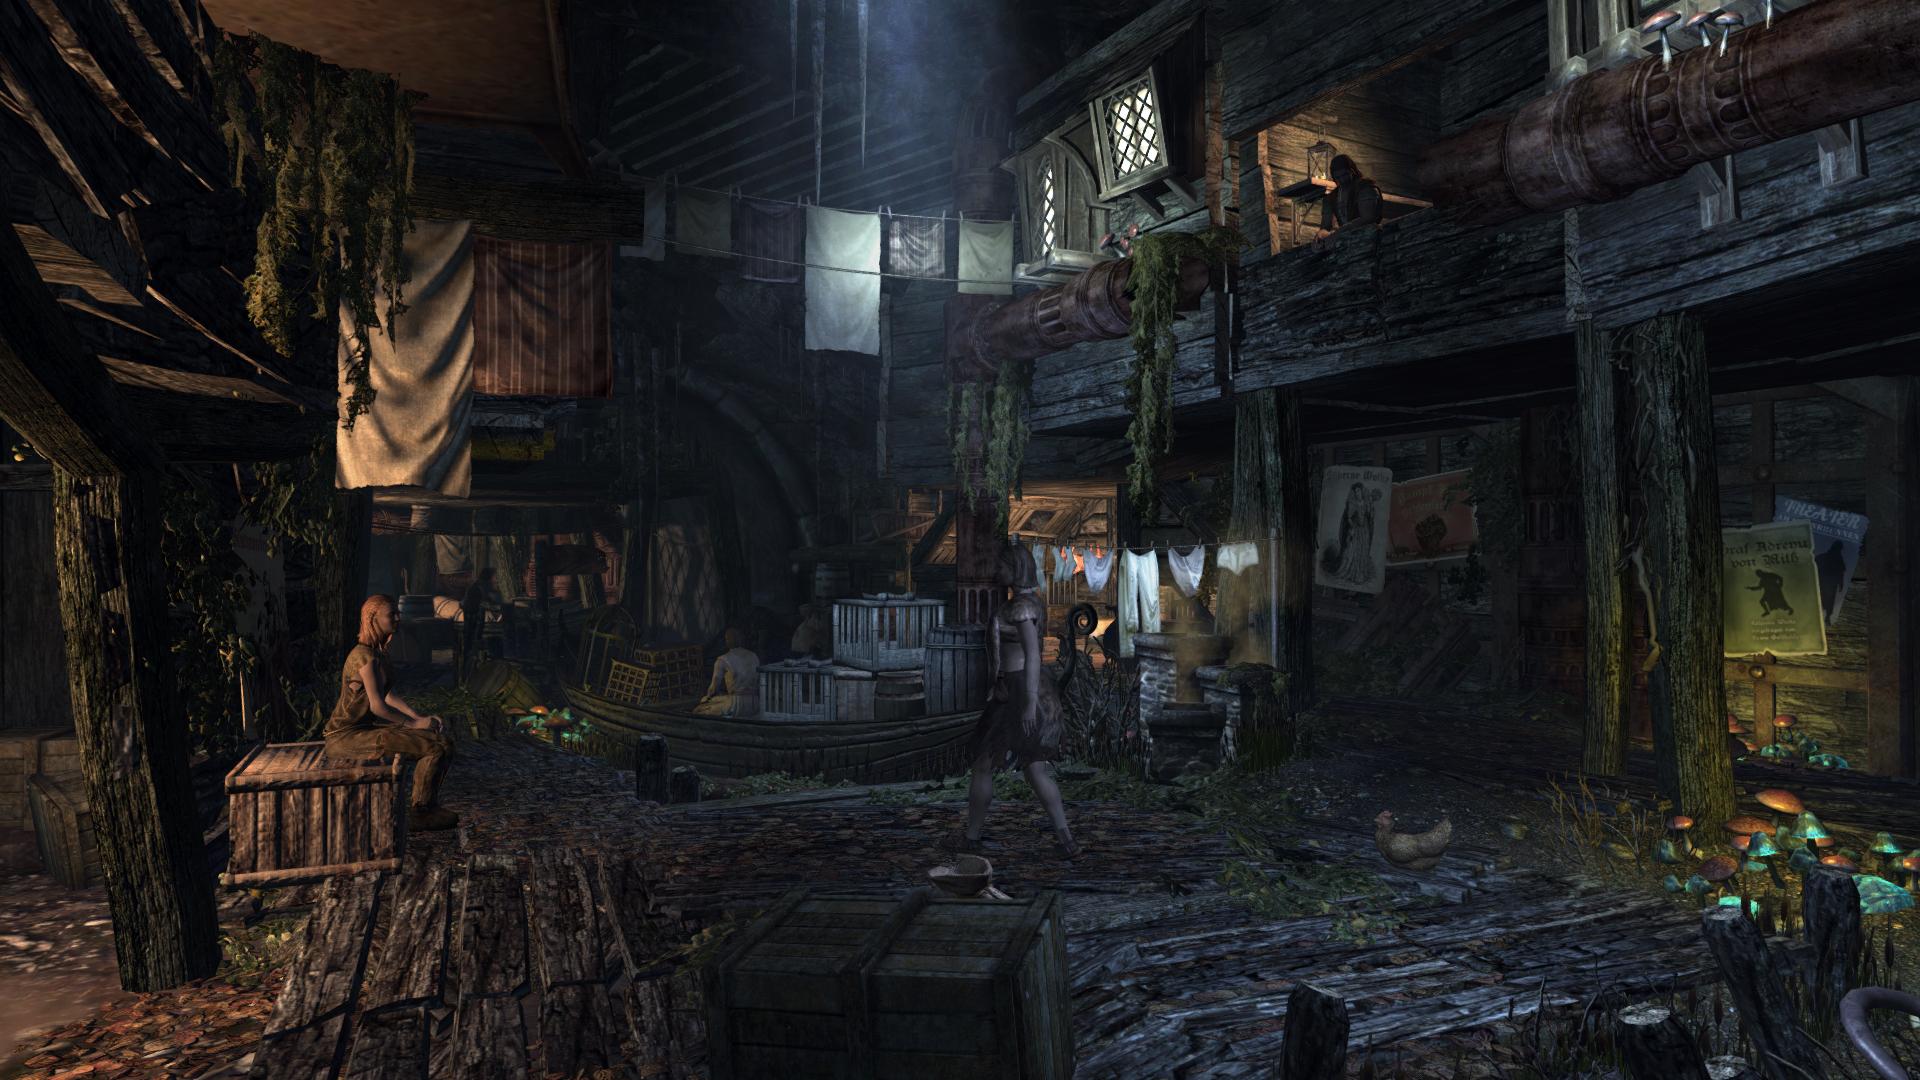 Biohazard Wallpaper 3d Short News The Undercity Enderal Mod For Elder Scrolls